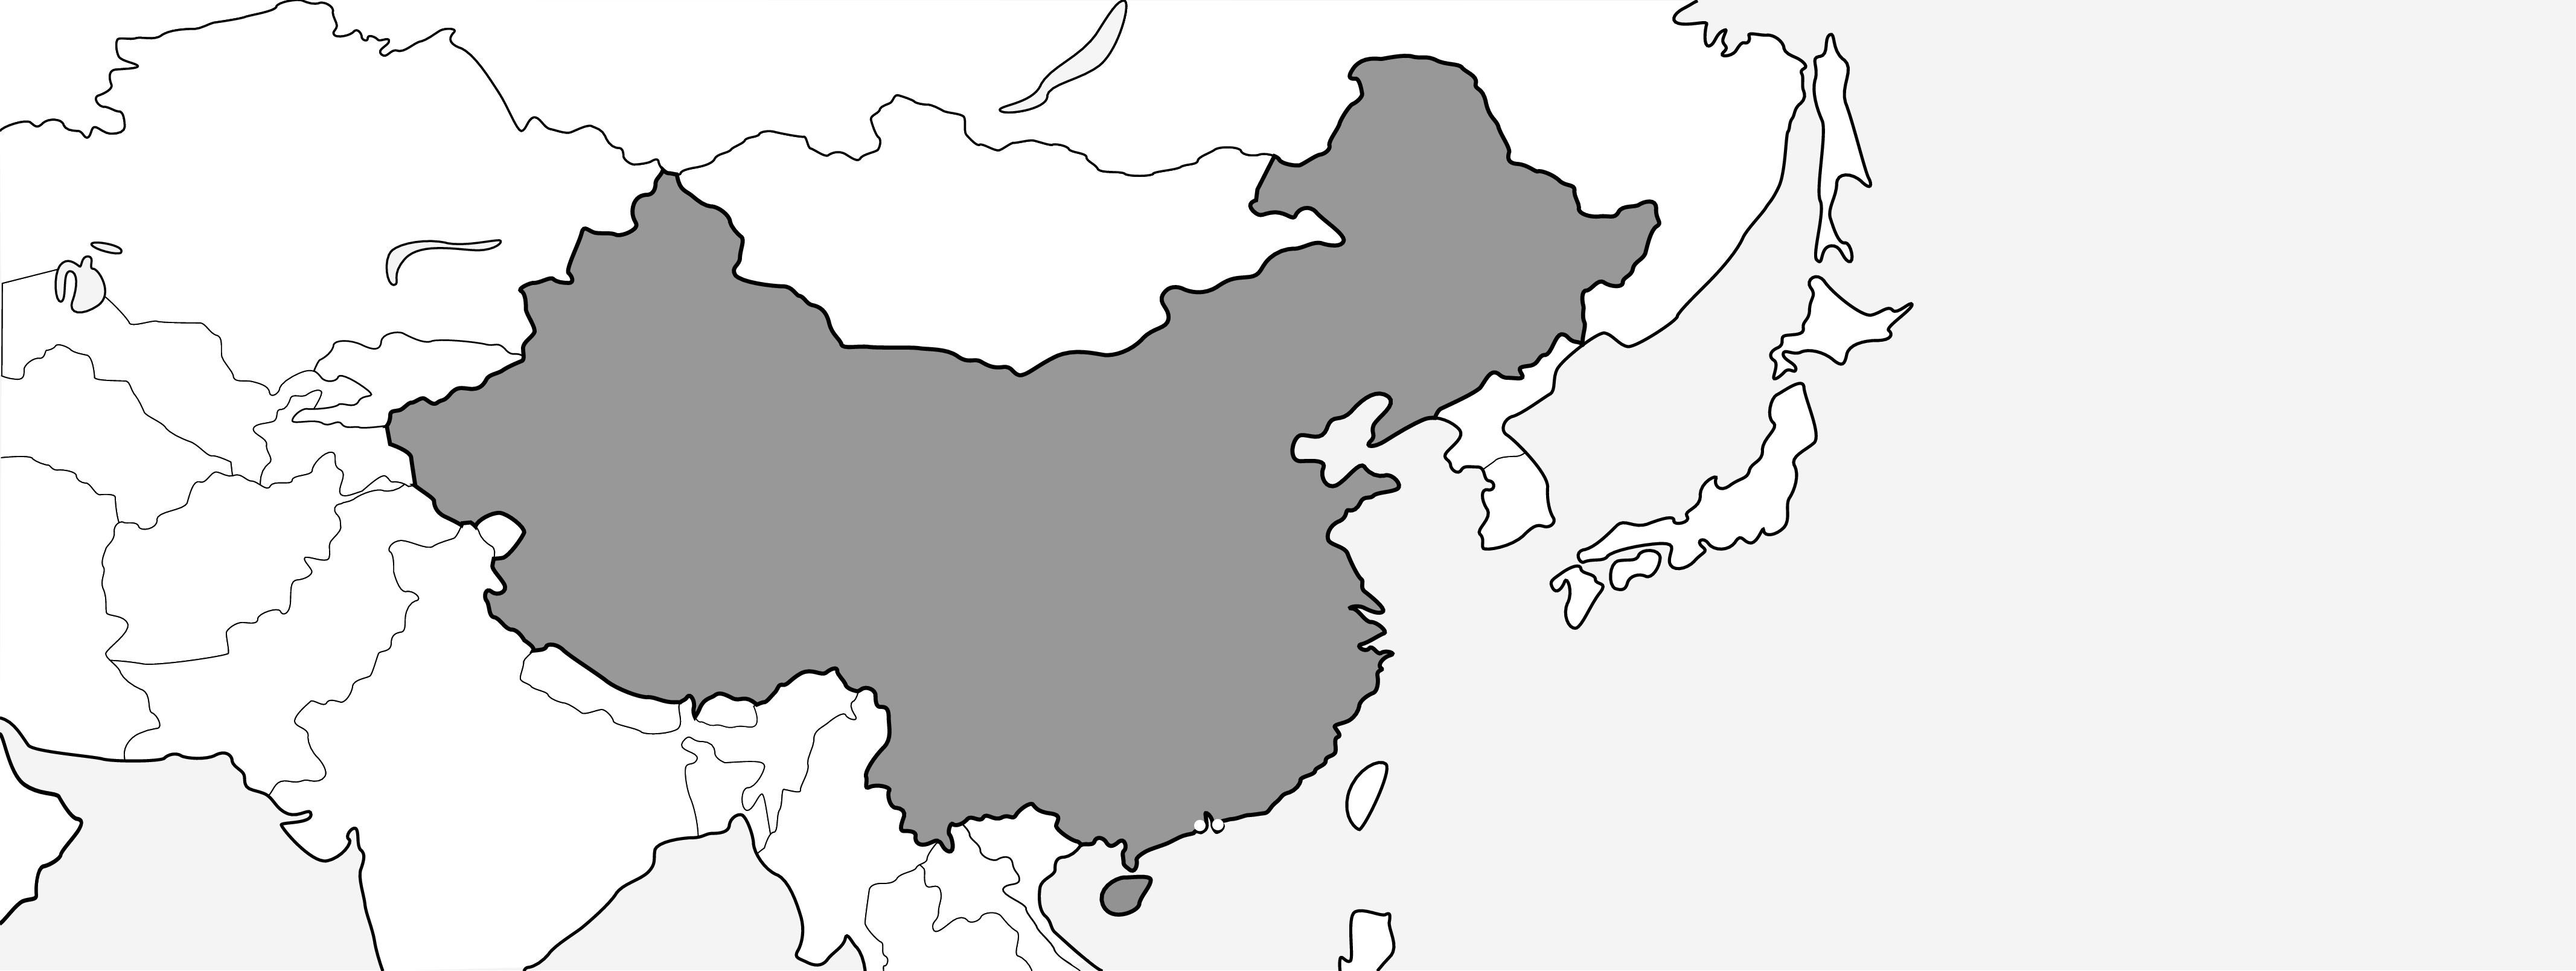 VOC可在标记为灰色的区域使用。VOC不可在香港或澳门地区使用。